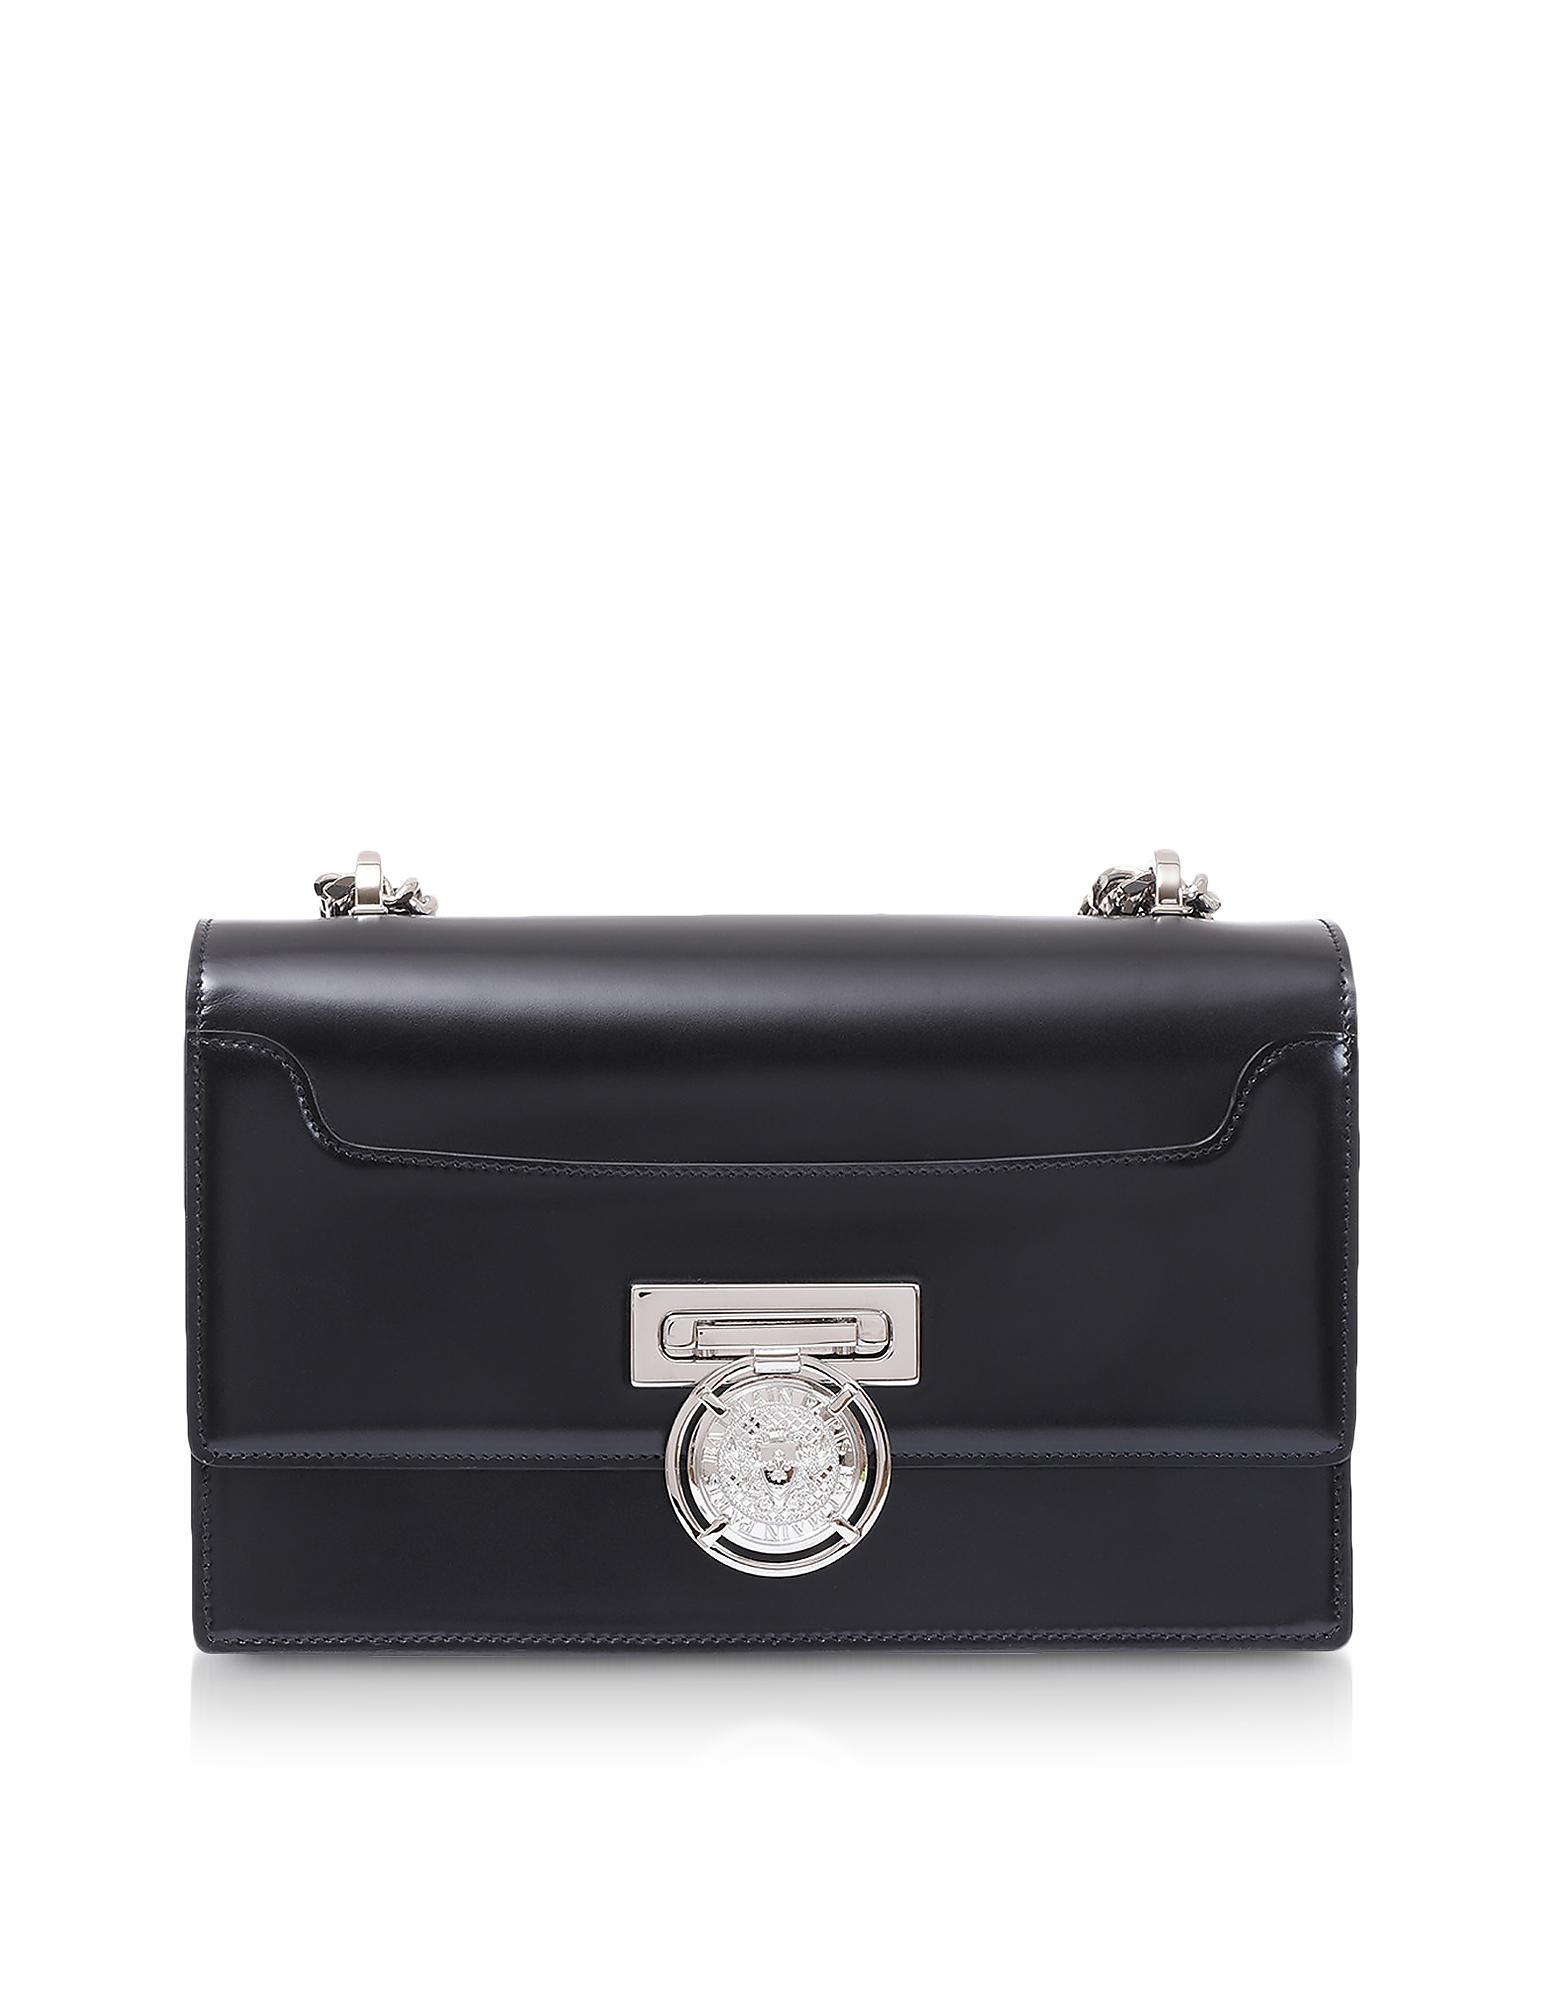 60946a4523 Balmain Black Smooth Leather Bbox 25 Flap Shoulder Bag in Black - Lyst